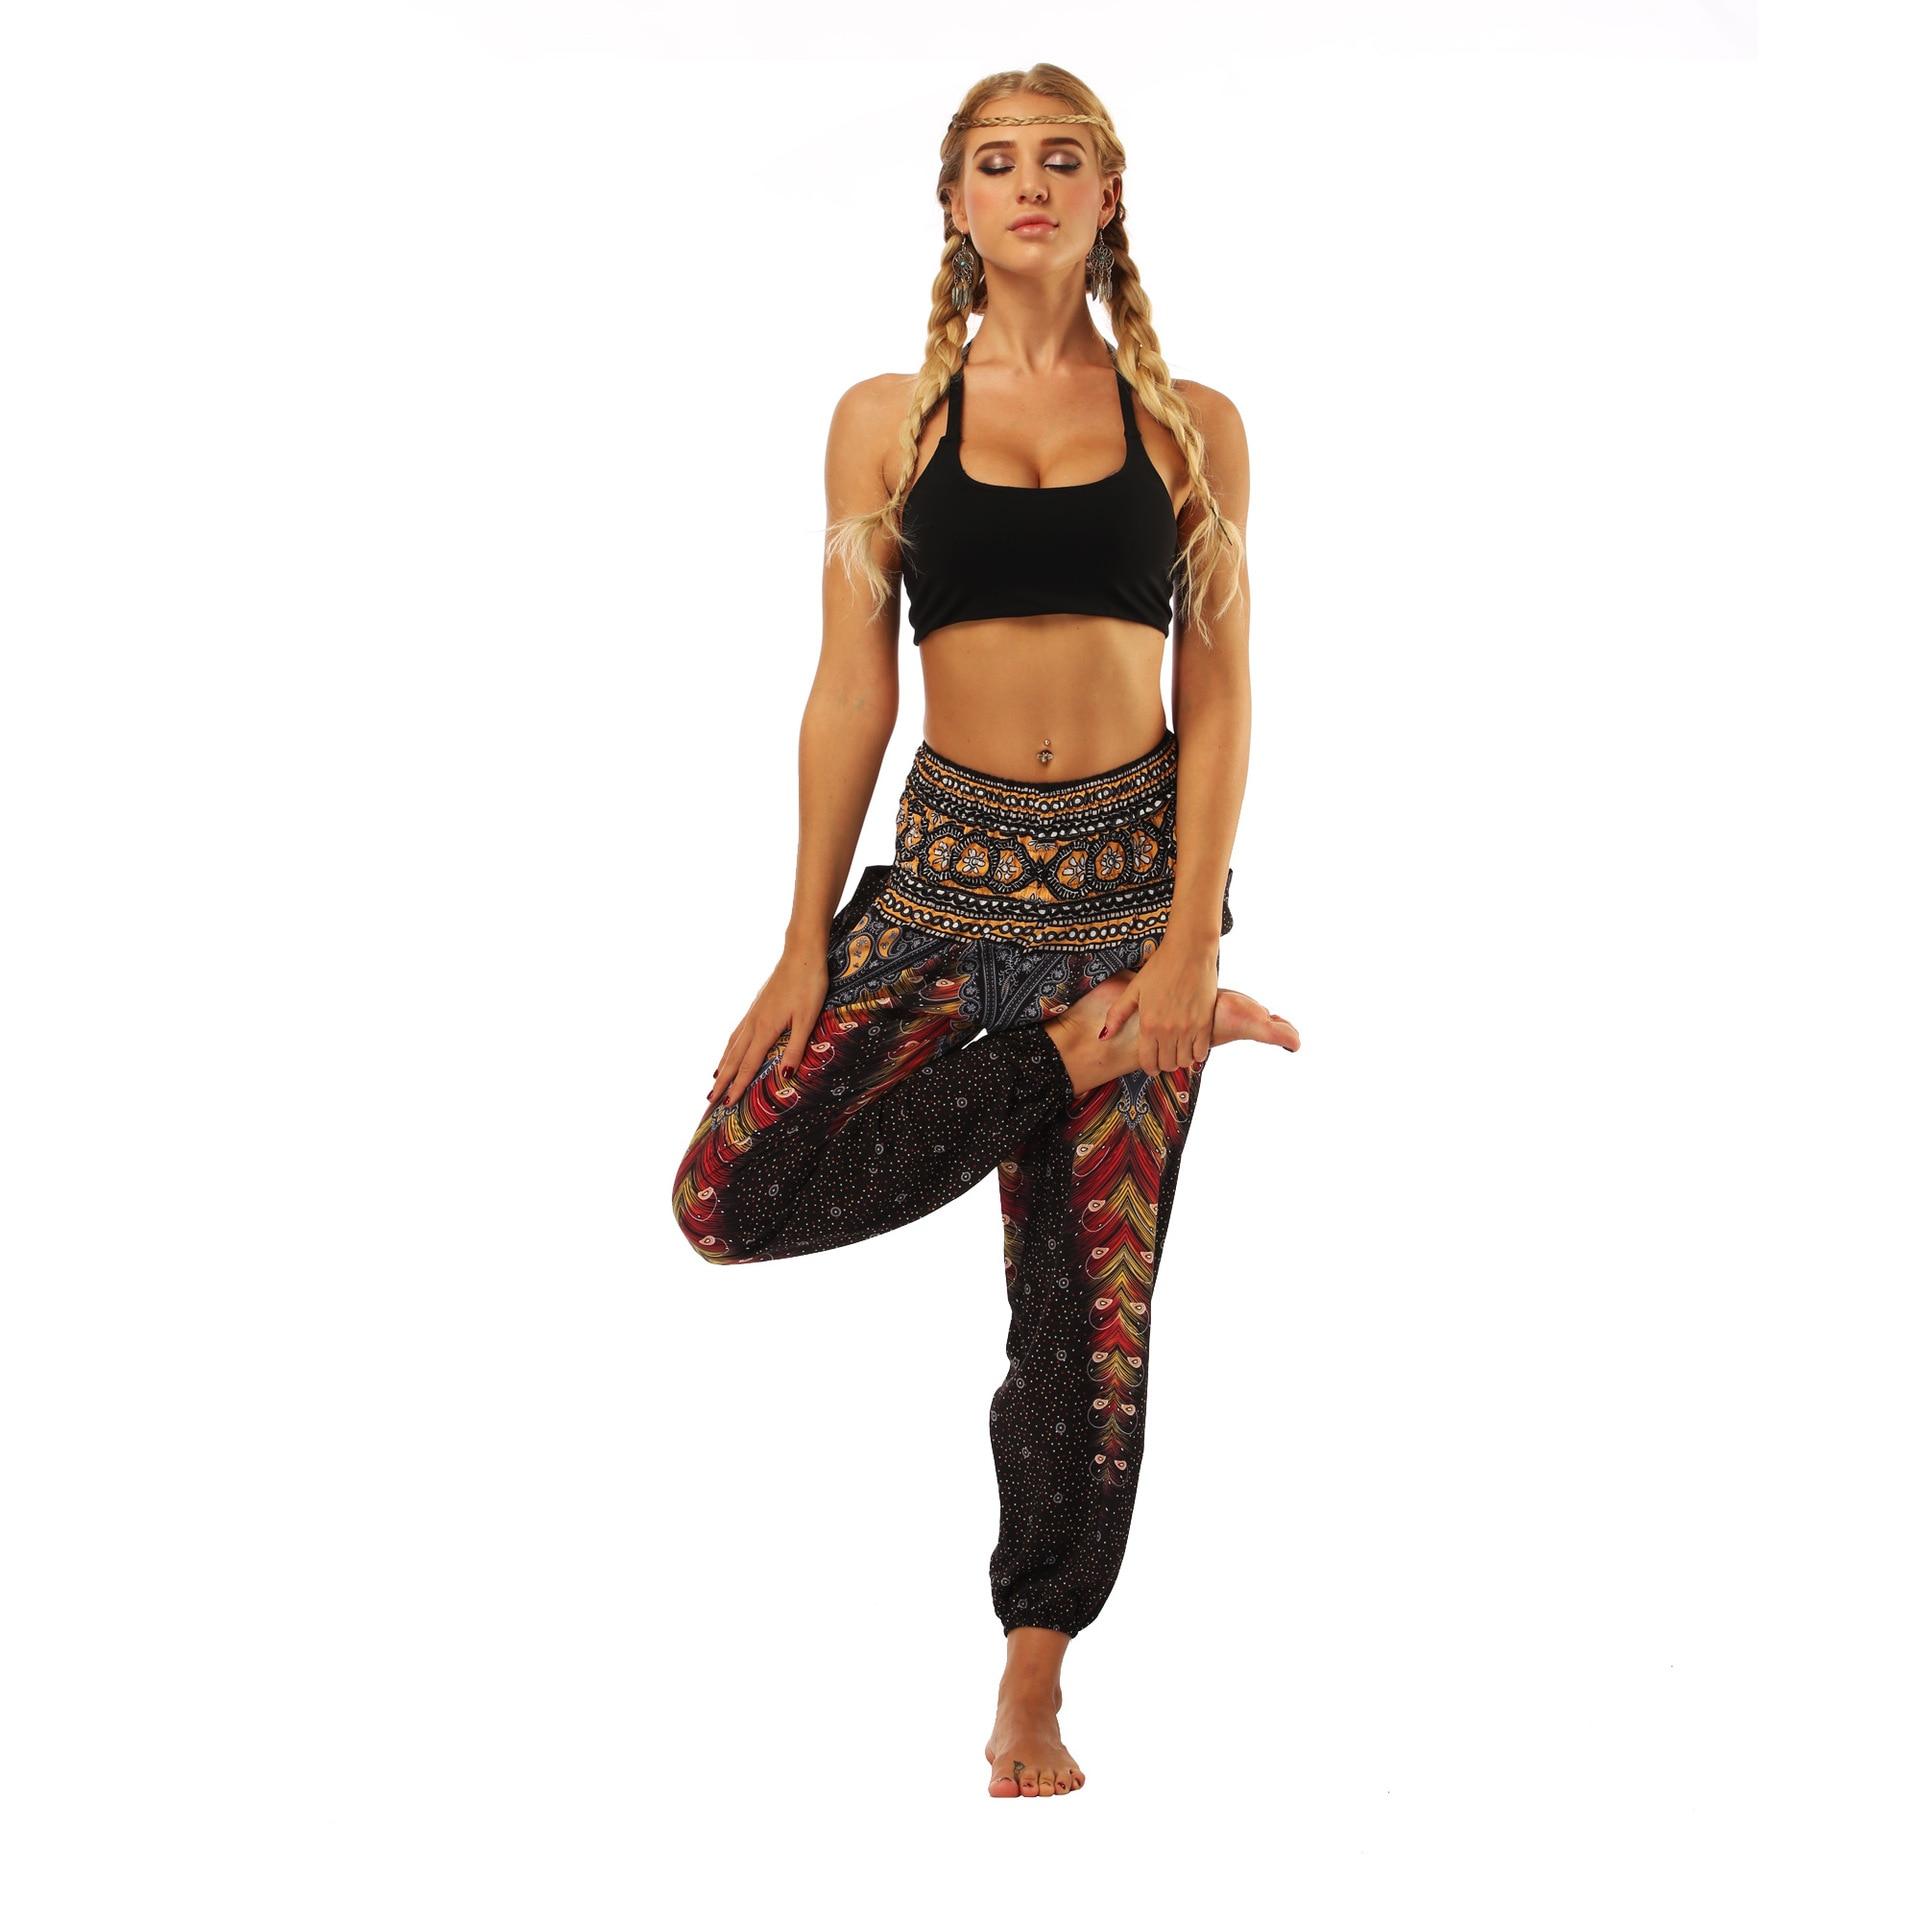 Women Harem Yoga Pant Hippie Rayon Loose High Waist Wide Leg Female Trousers Running Casual Festival Beach Jogger Sports Pants